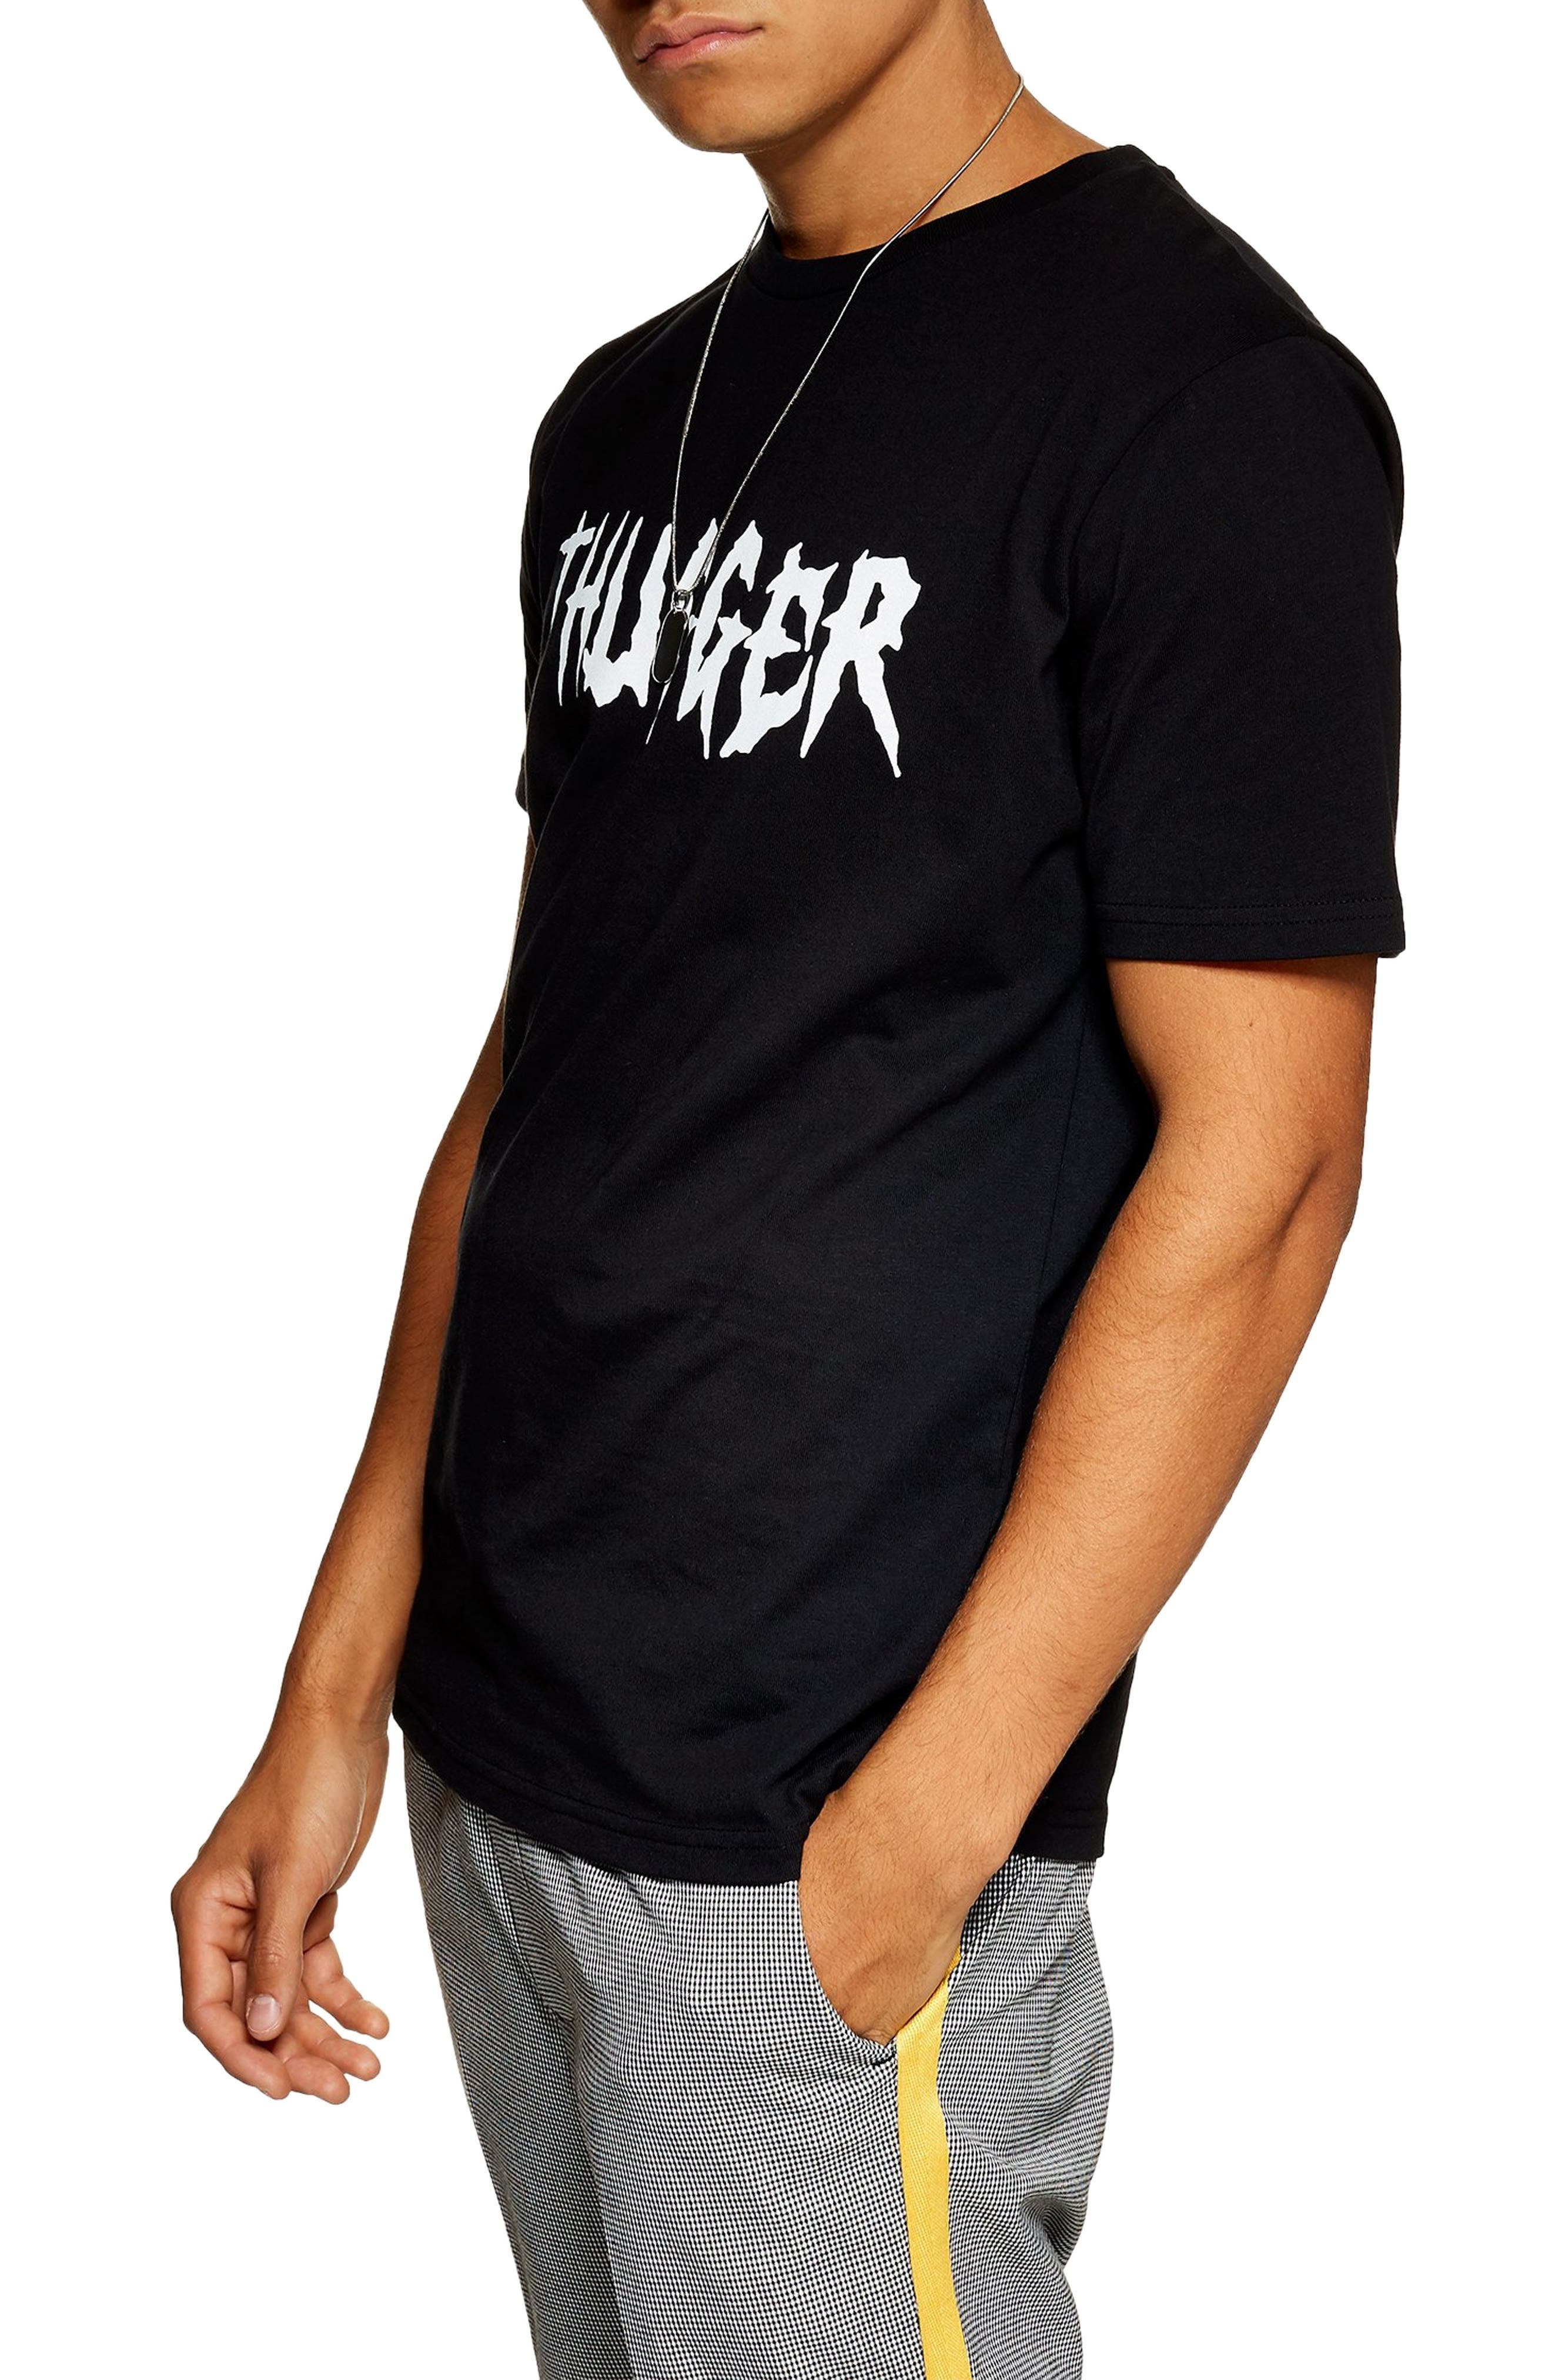 Thugger Graphic T-Shirt,                             Main thumbnail 1, color,                             001